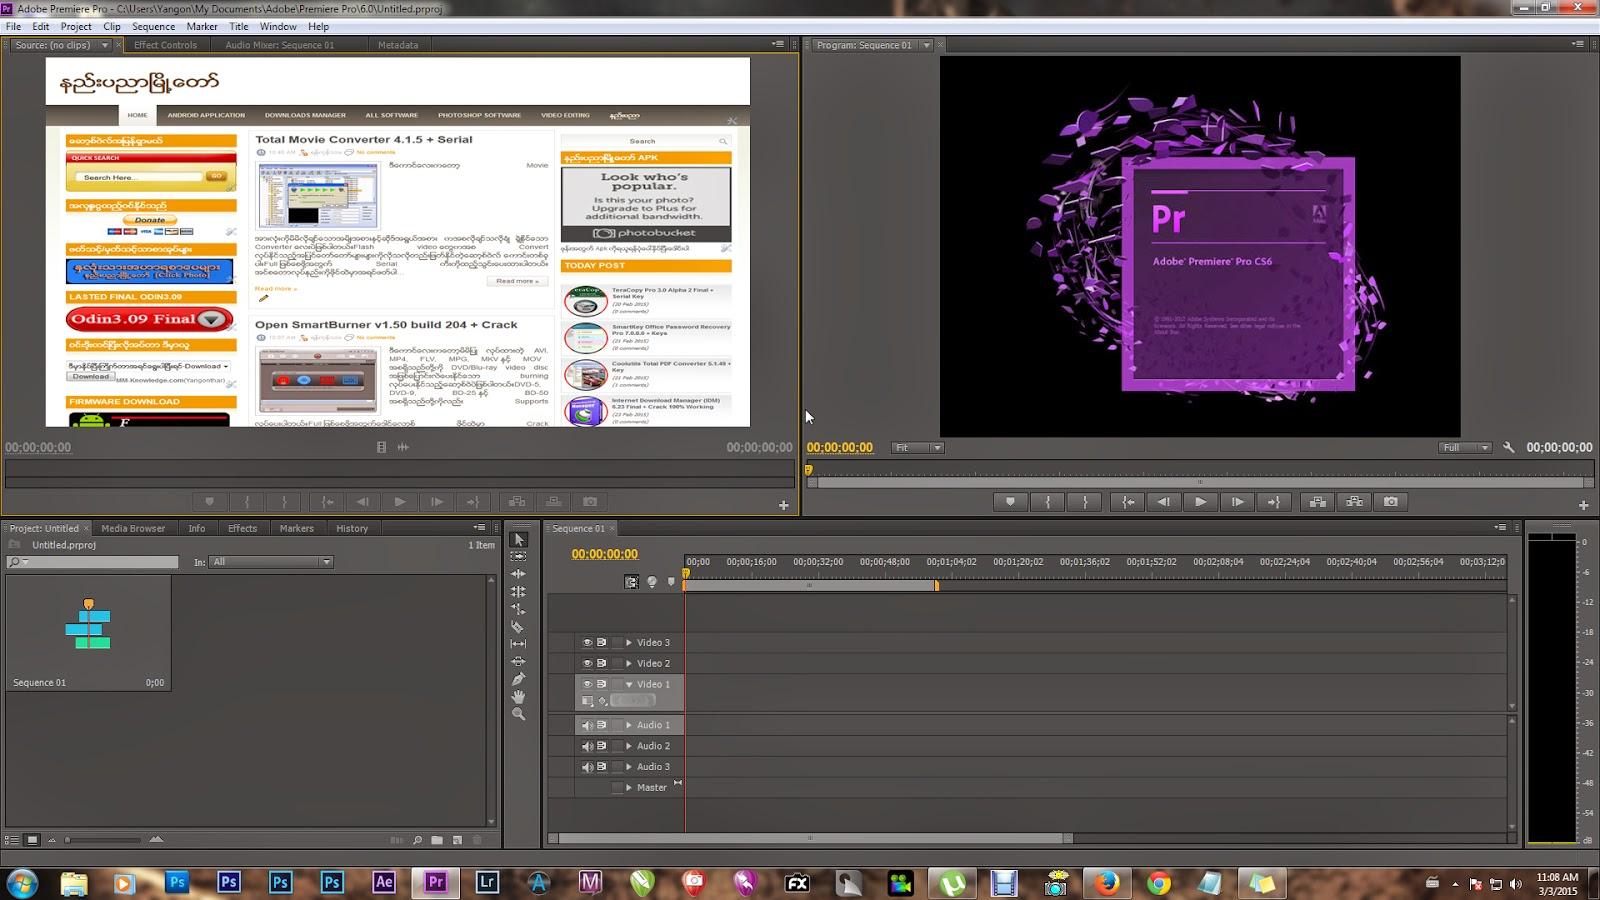 Adobe premiere pro cs4 low price